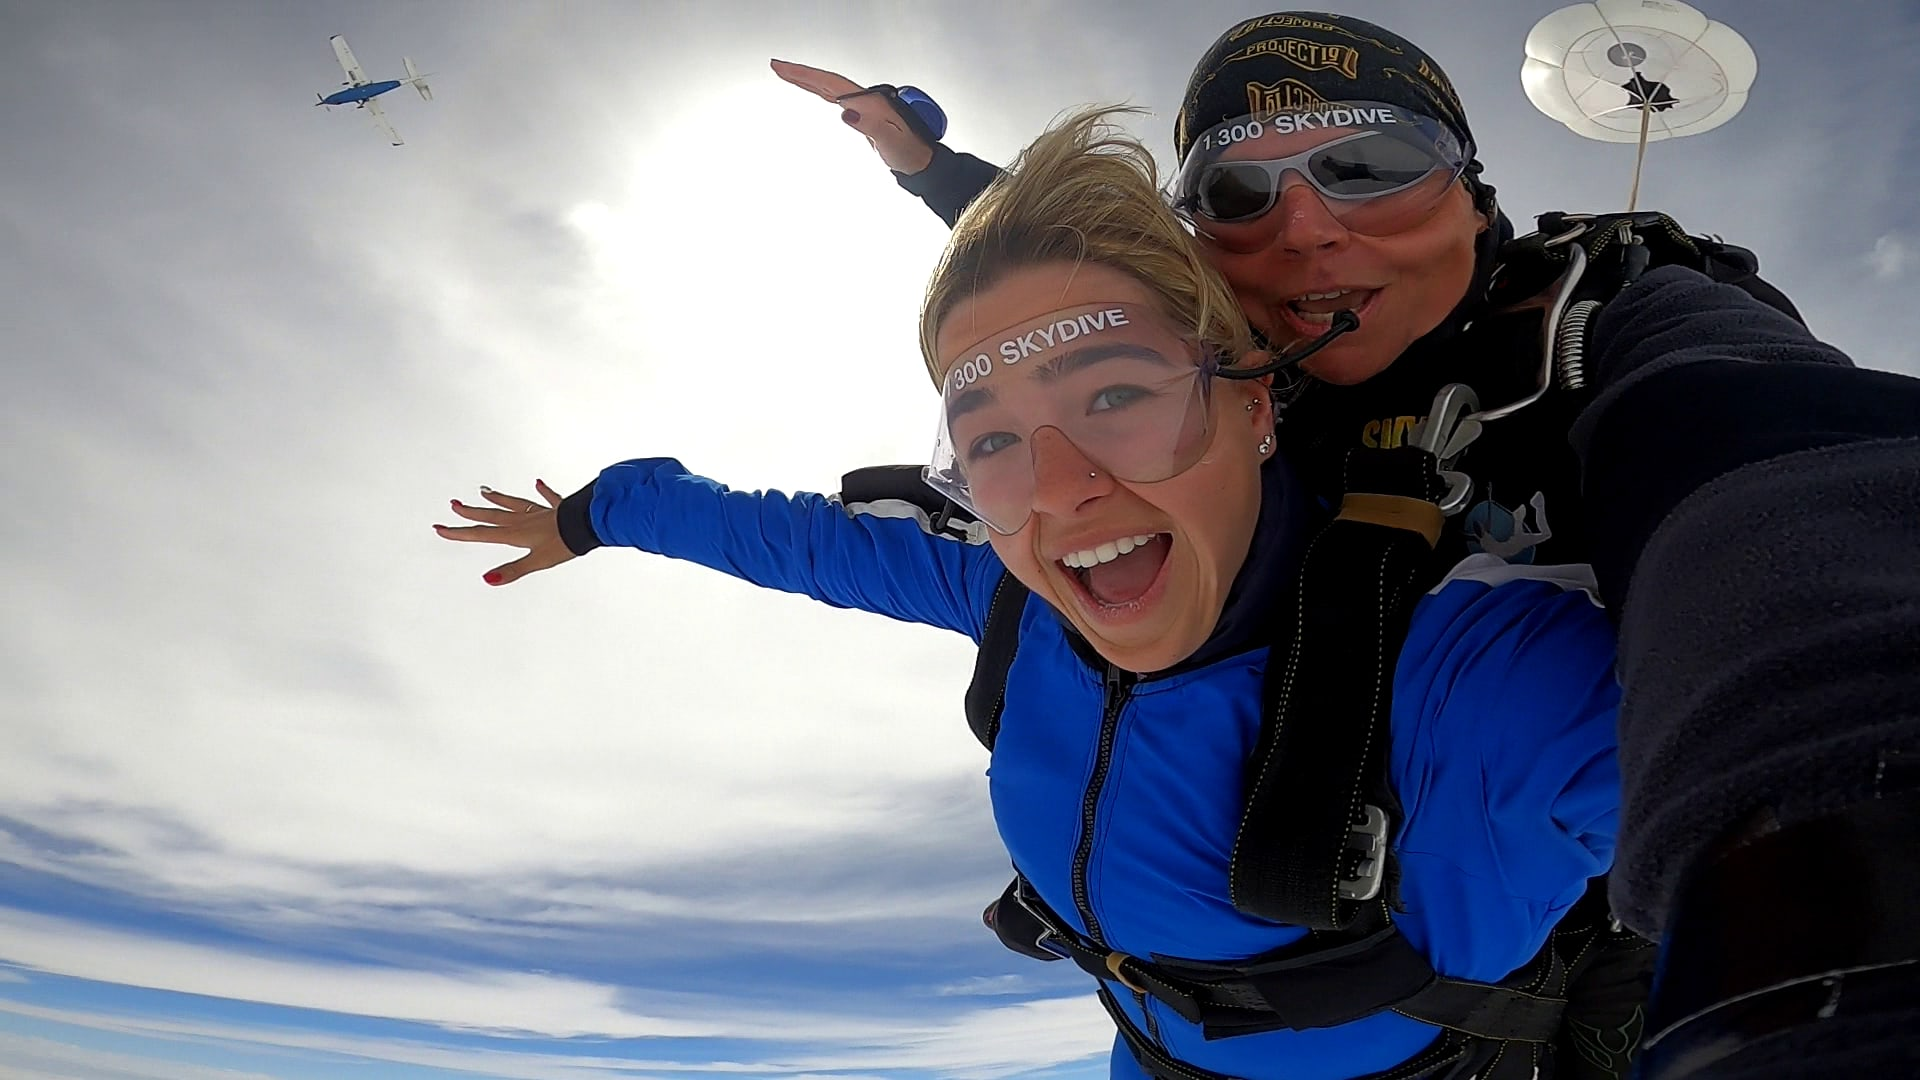 Tandem Skydive 14,000ft, Weekday Special - Sydney